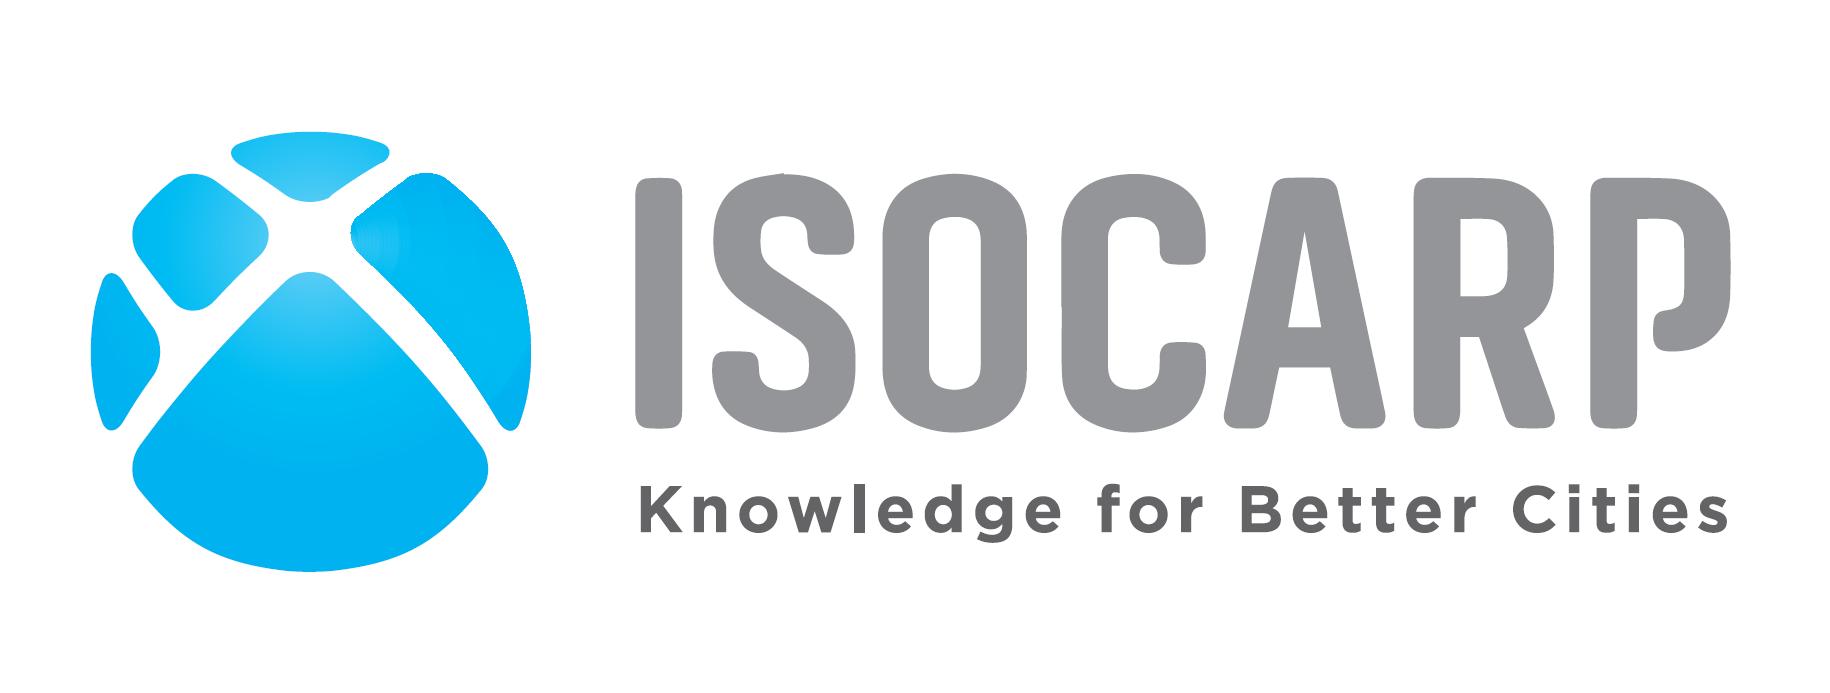 ISOCARP